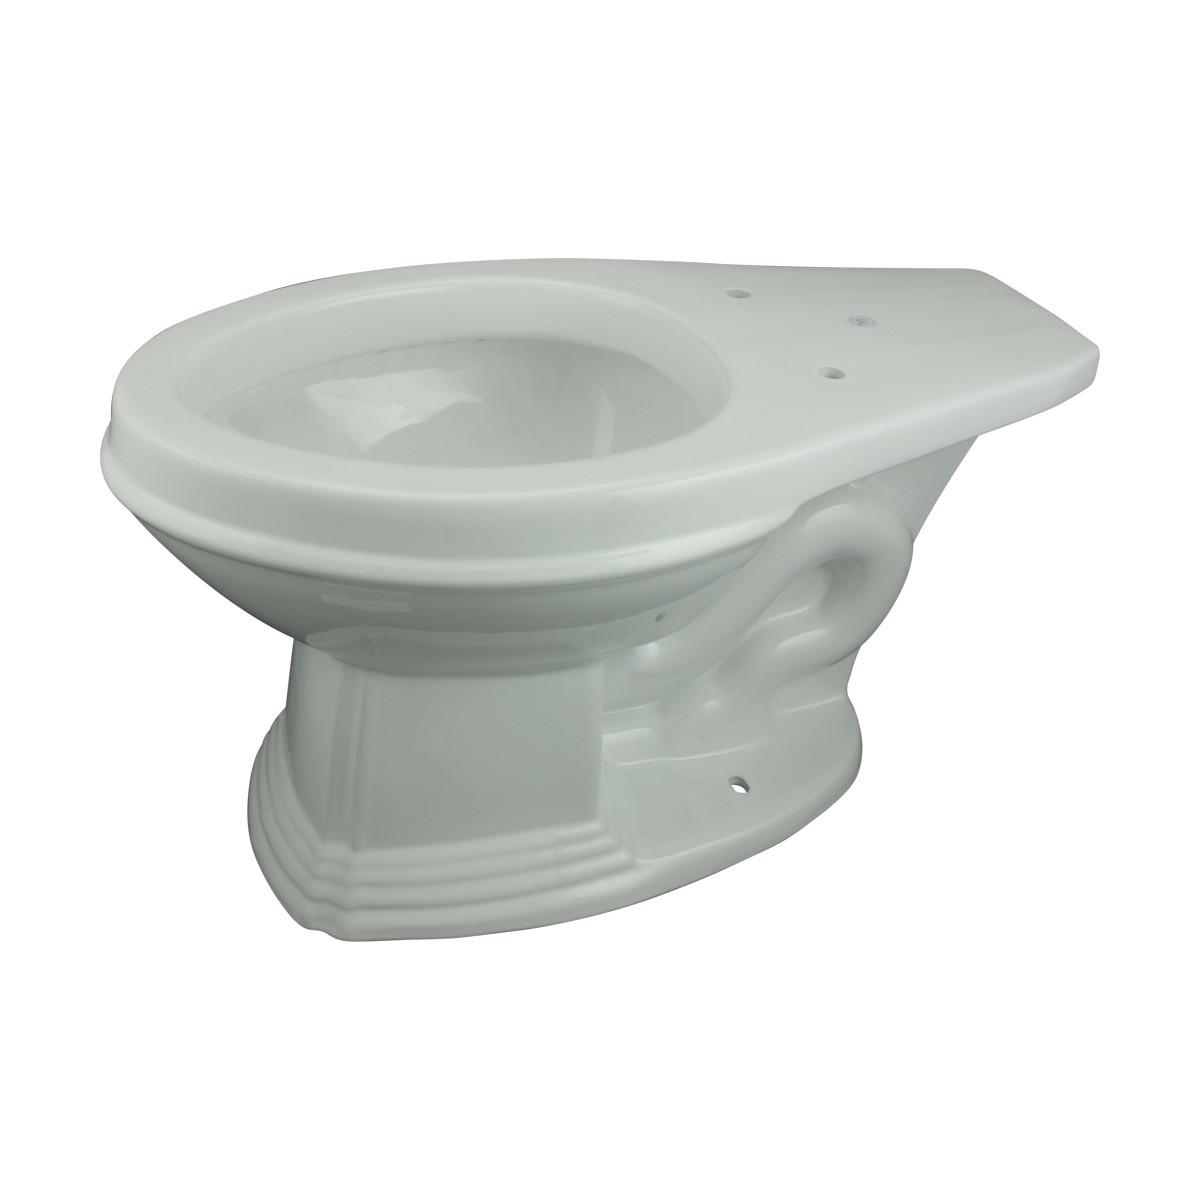 Dark Oak High Tank LPipe Toilet Elongated White Bowl High Tank Pull Chain Toilets High Tank Toilet with Elongated Bowl Old Fashioned Toilet